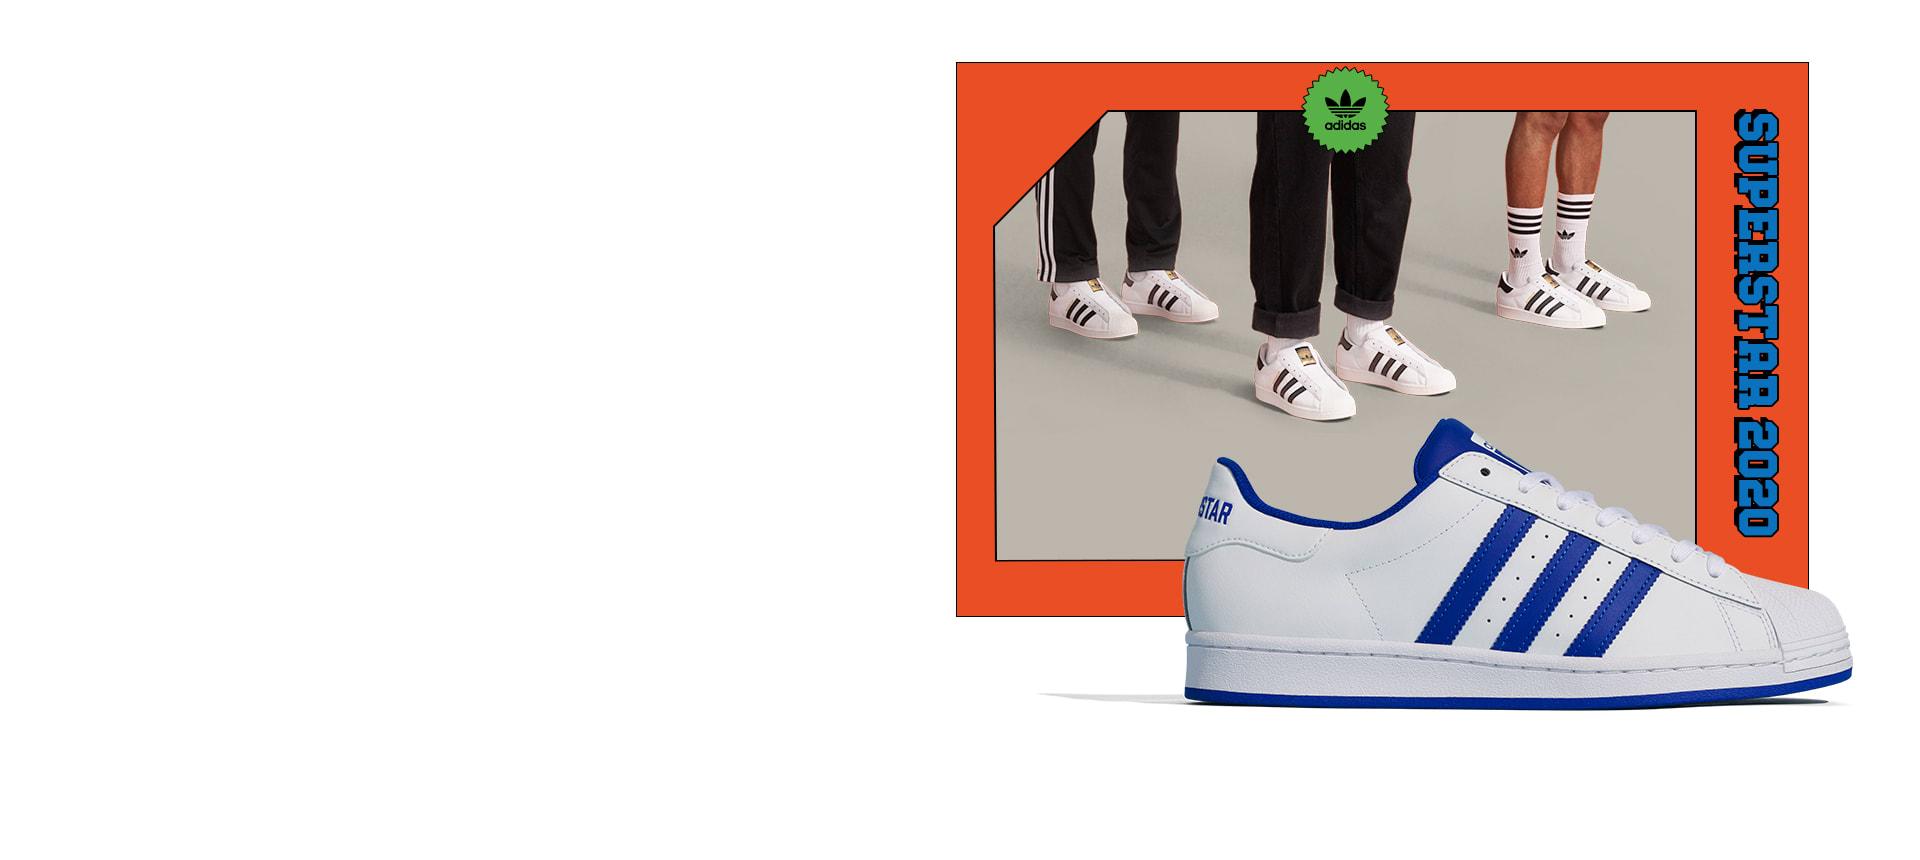 adidas italia email